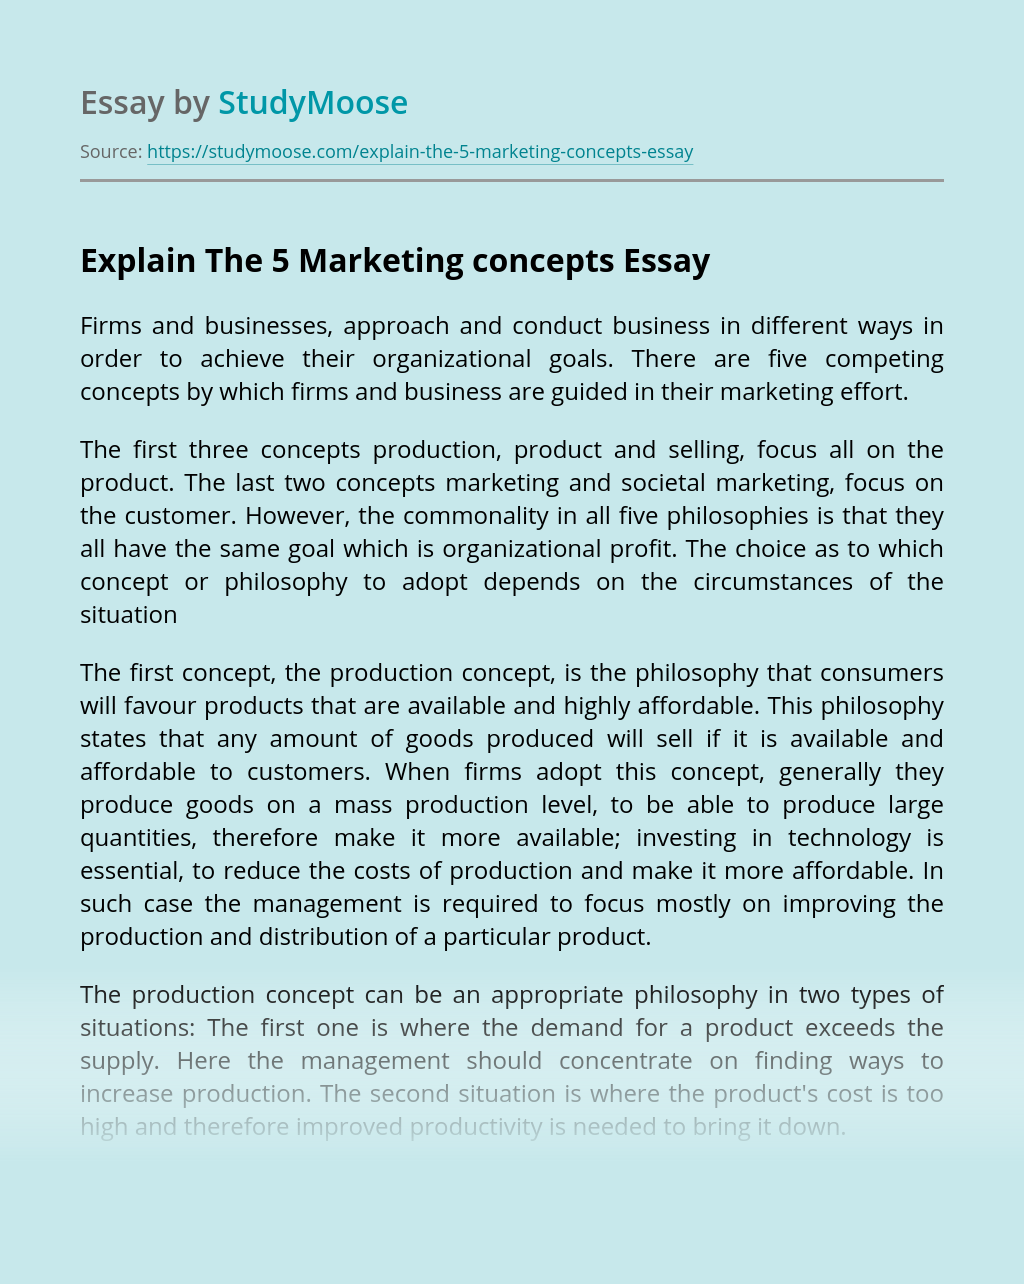 Explain The 5 Marketing concepts